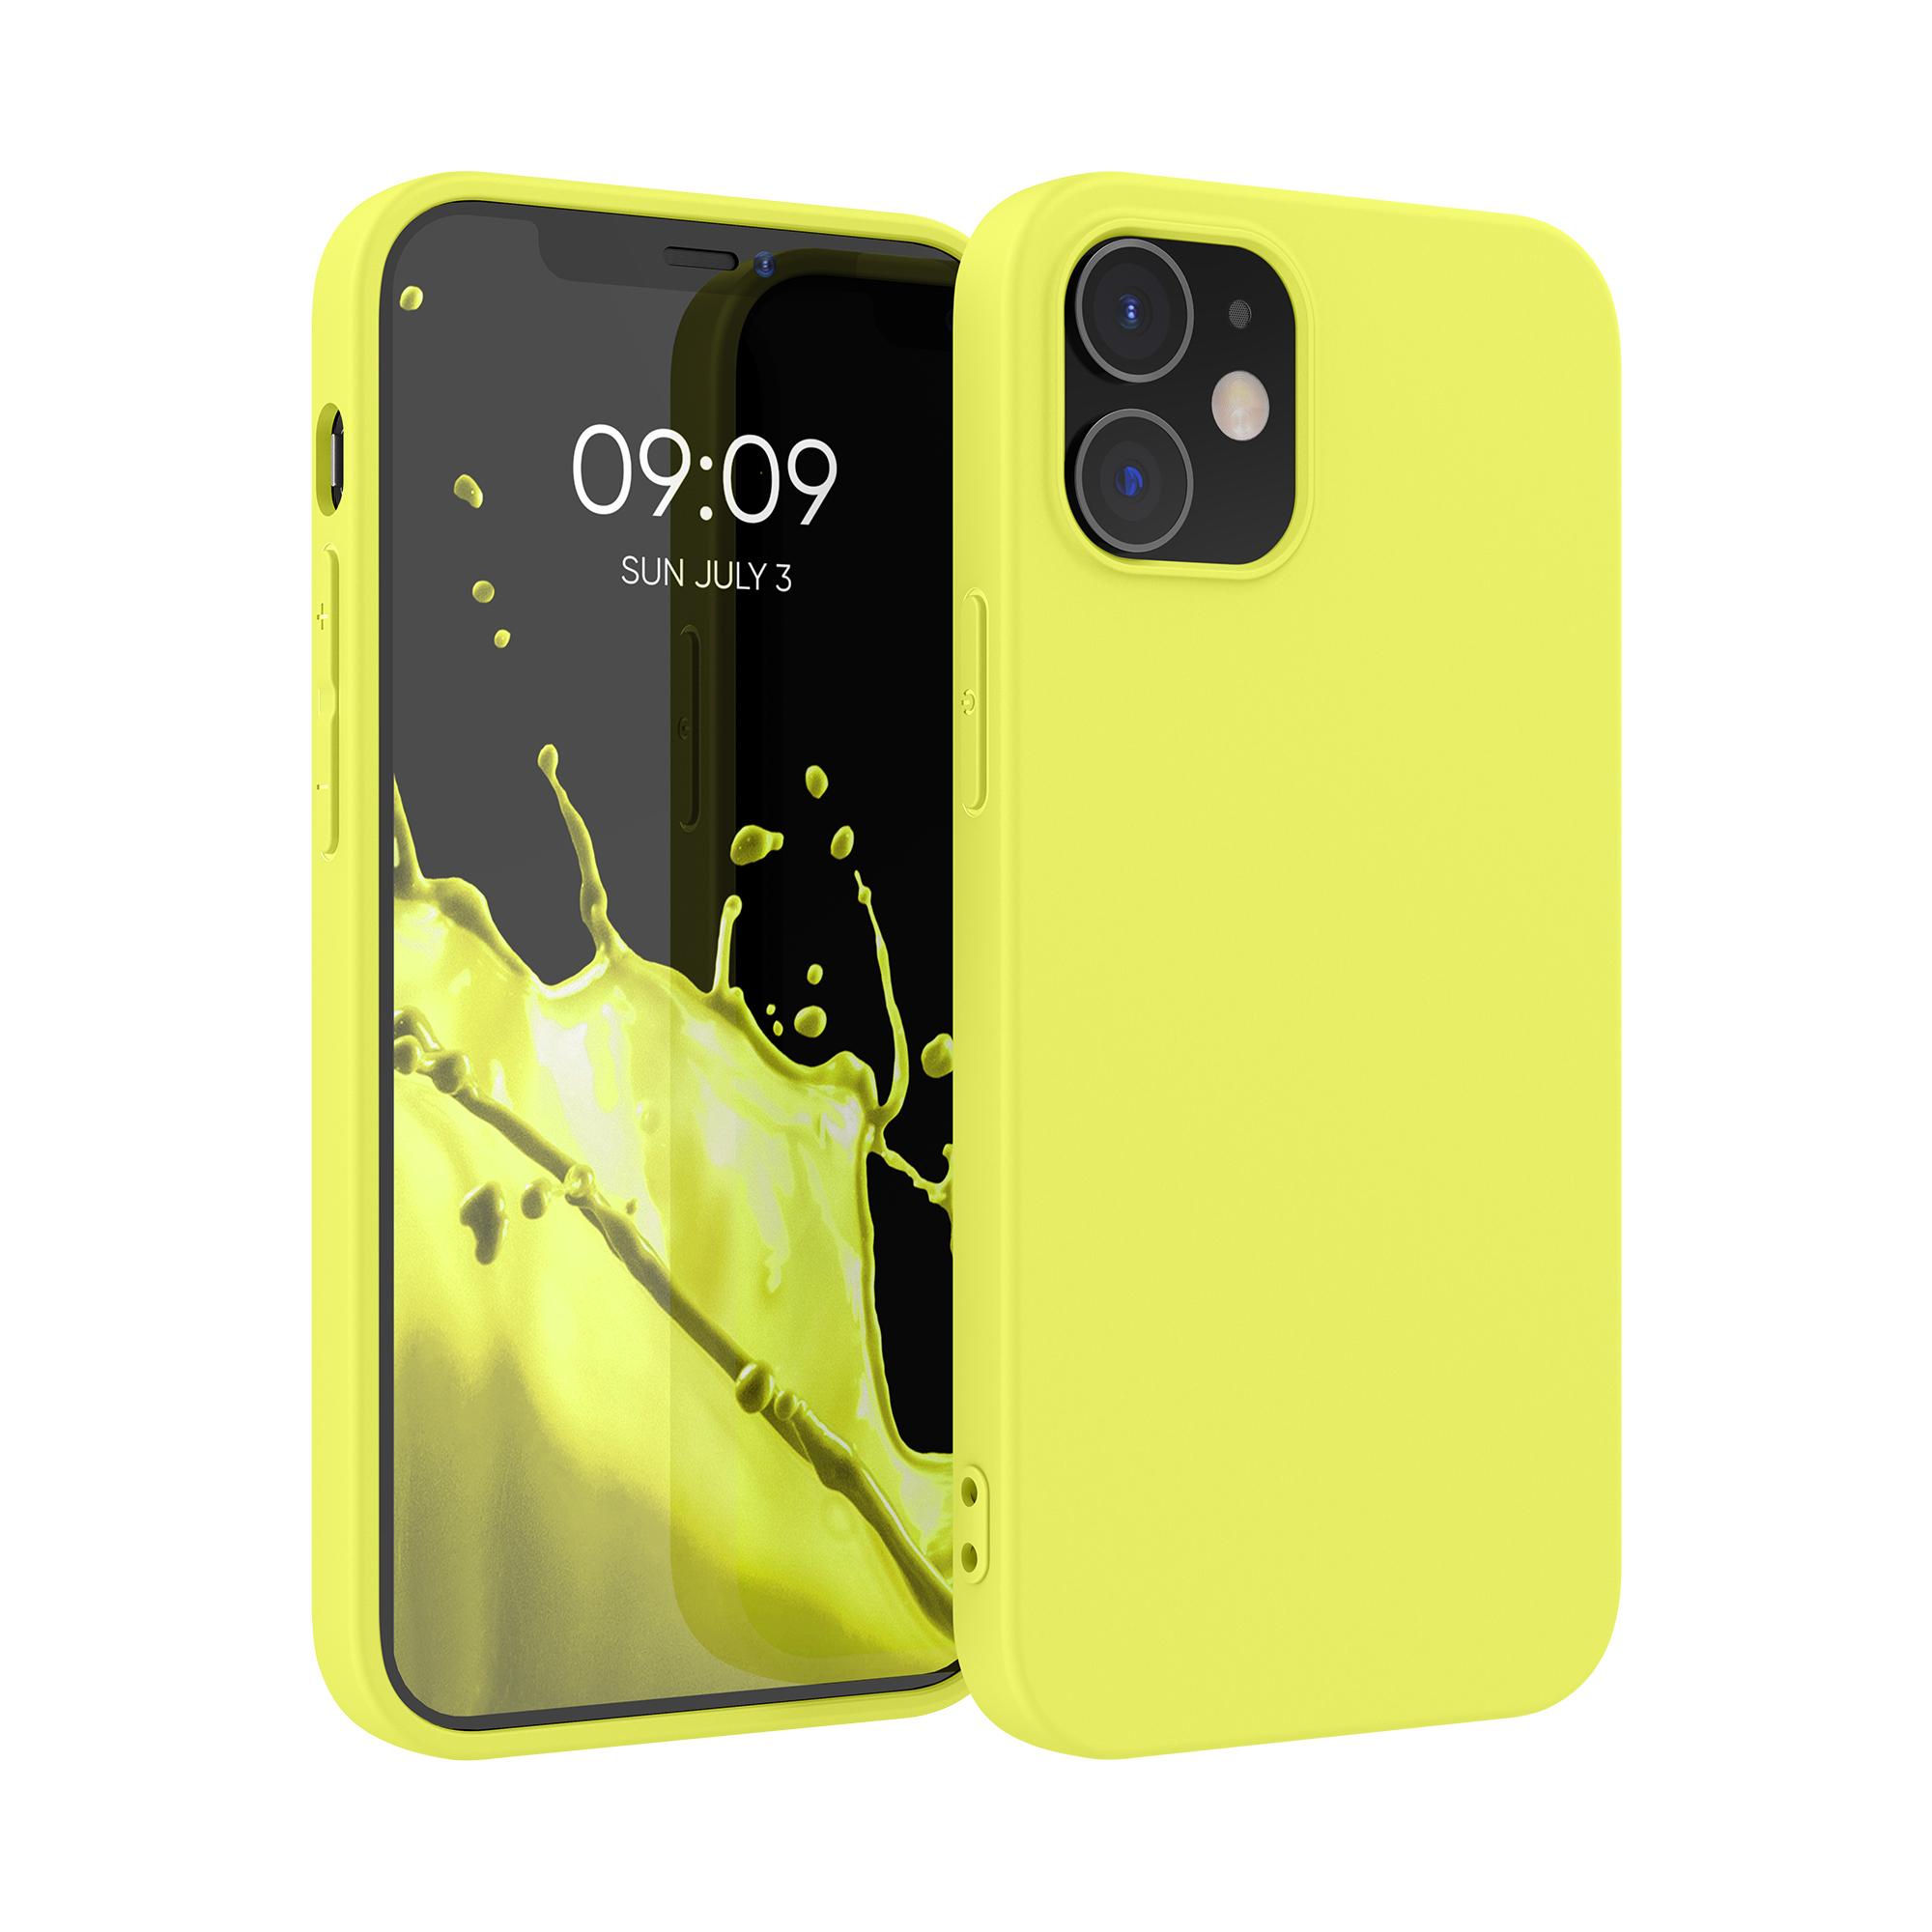 Kvalitní silikonové TPU pouzdro pro Apple iPhone 12 / 12 Pro - Pastel Yellow Matte